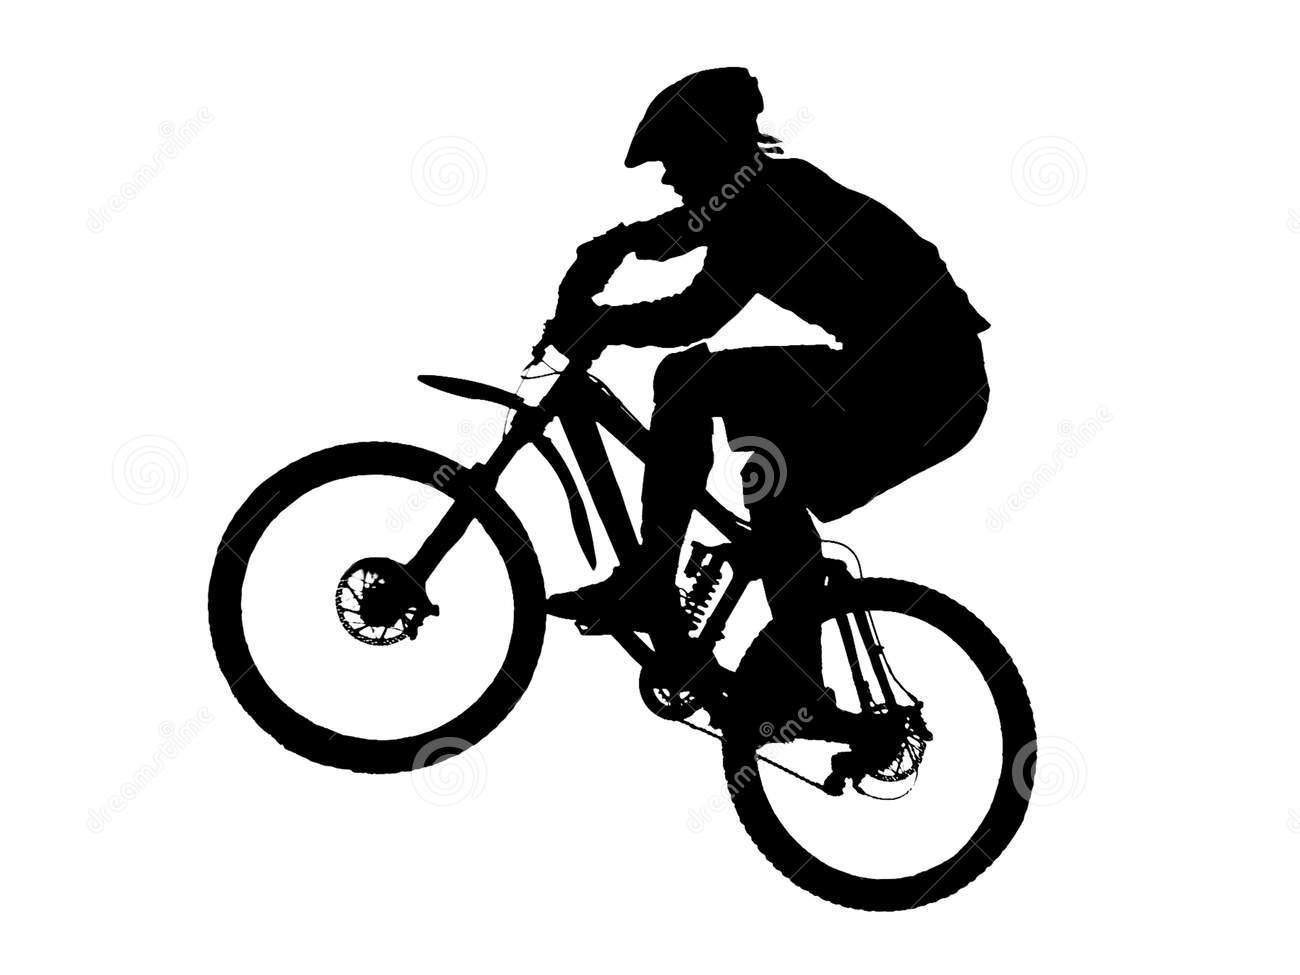 Mountain bike ride clipart black and white picture black and white stock Mountain Bike Clipart | Free download best Mountain Bike ... picture black and white stock